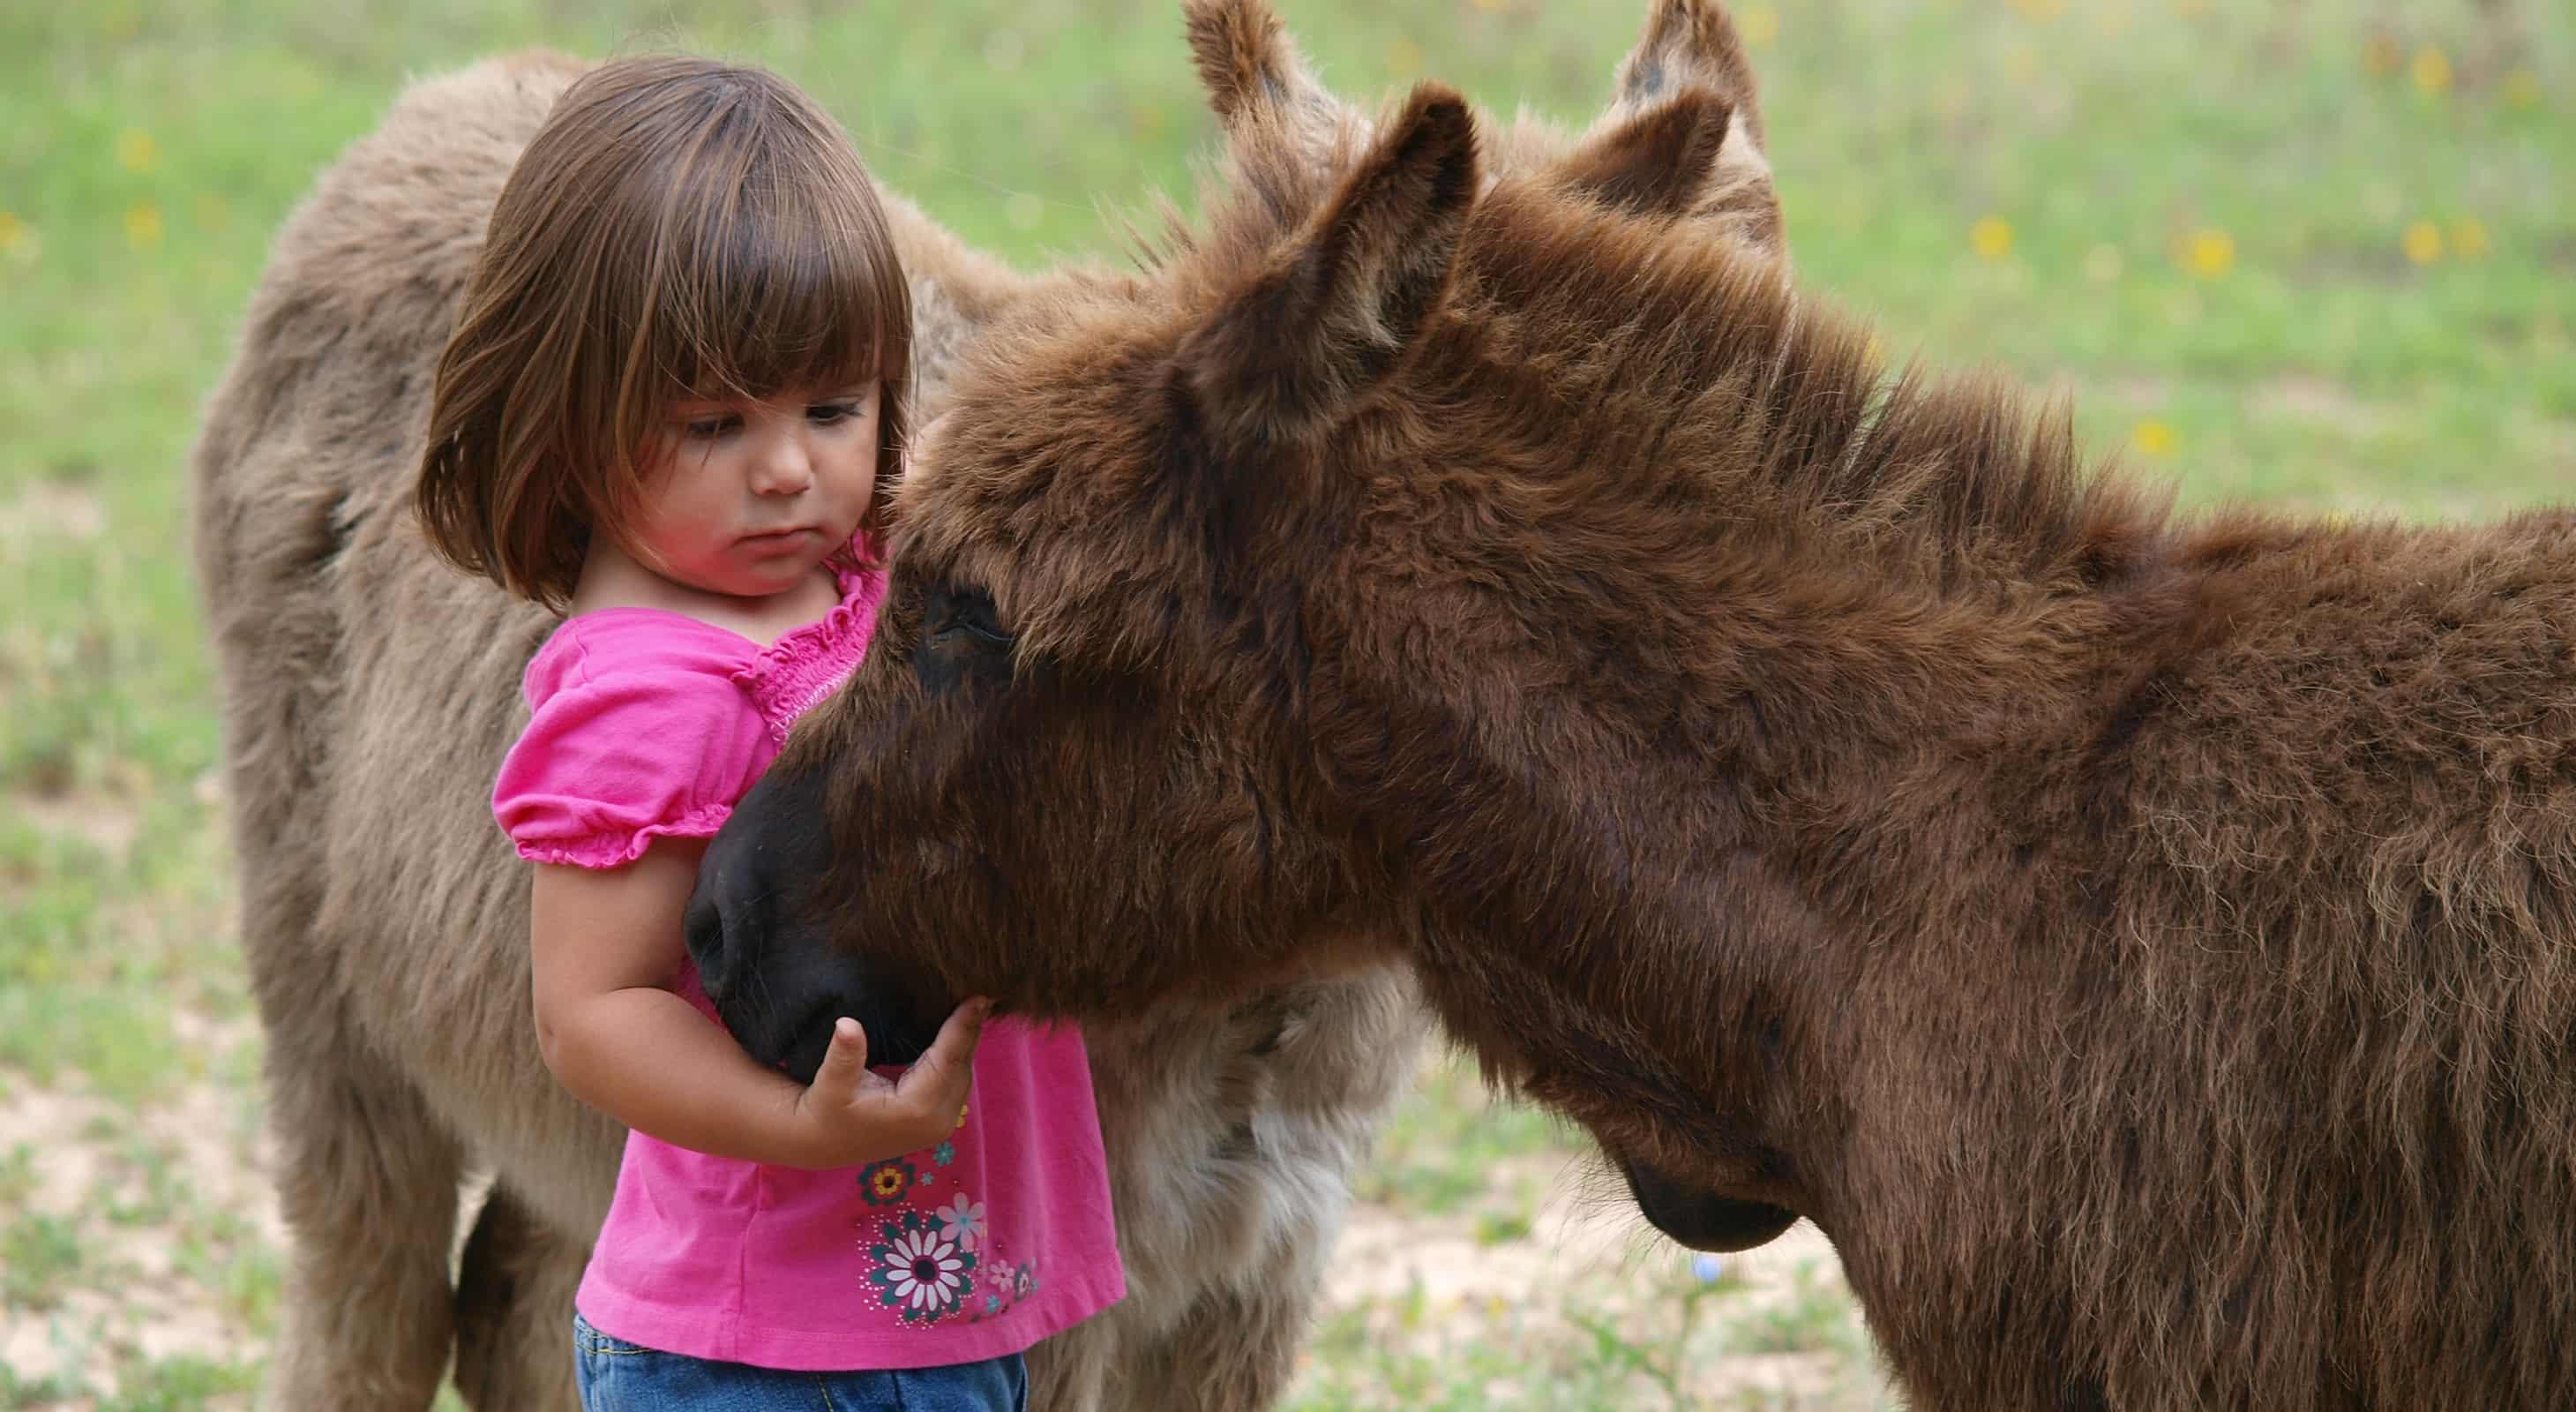 Little girl petting ranch animals